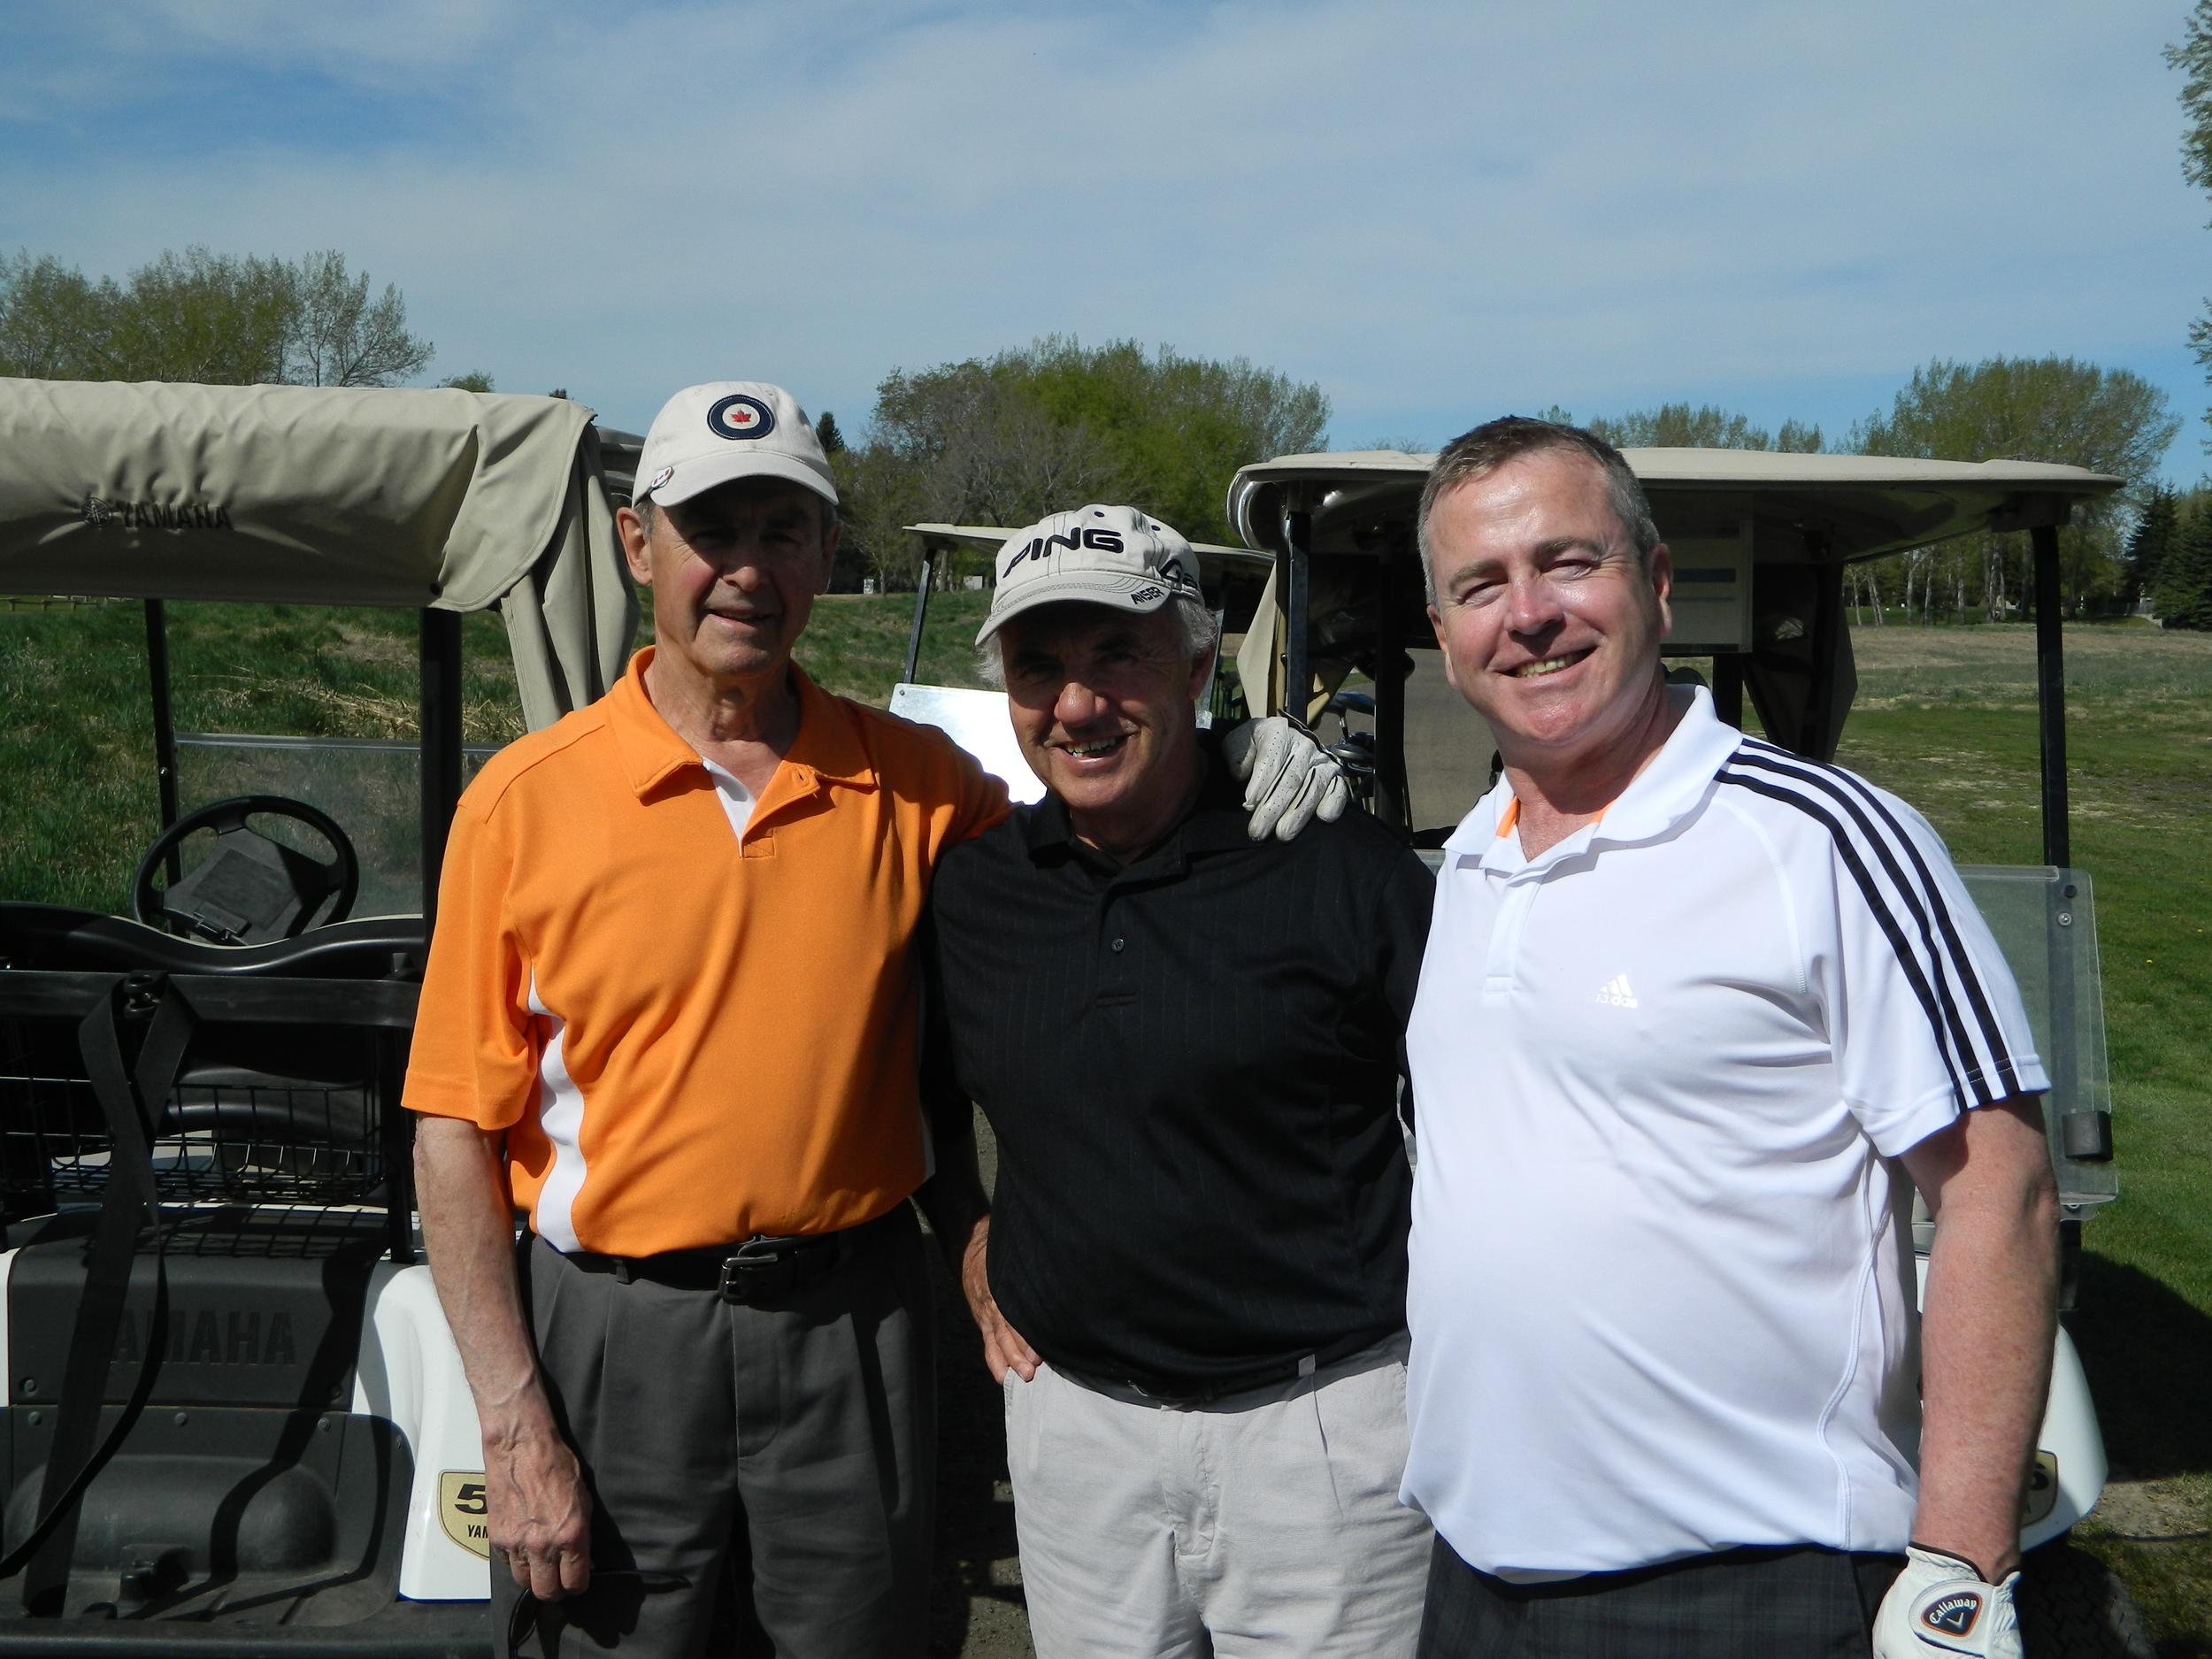 204 golfer pictures 021.jpg